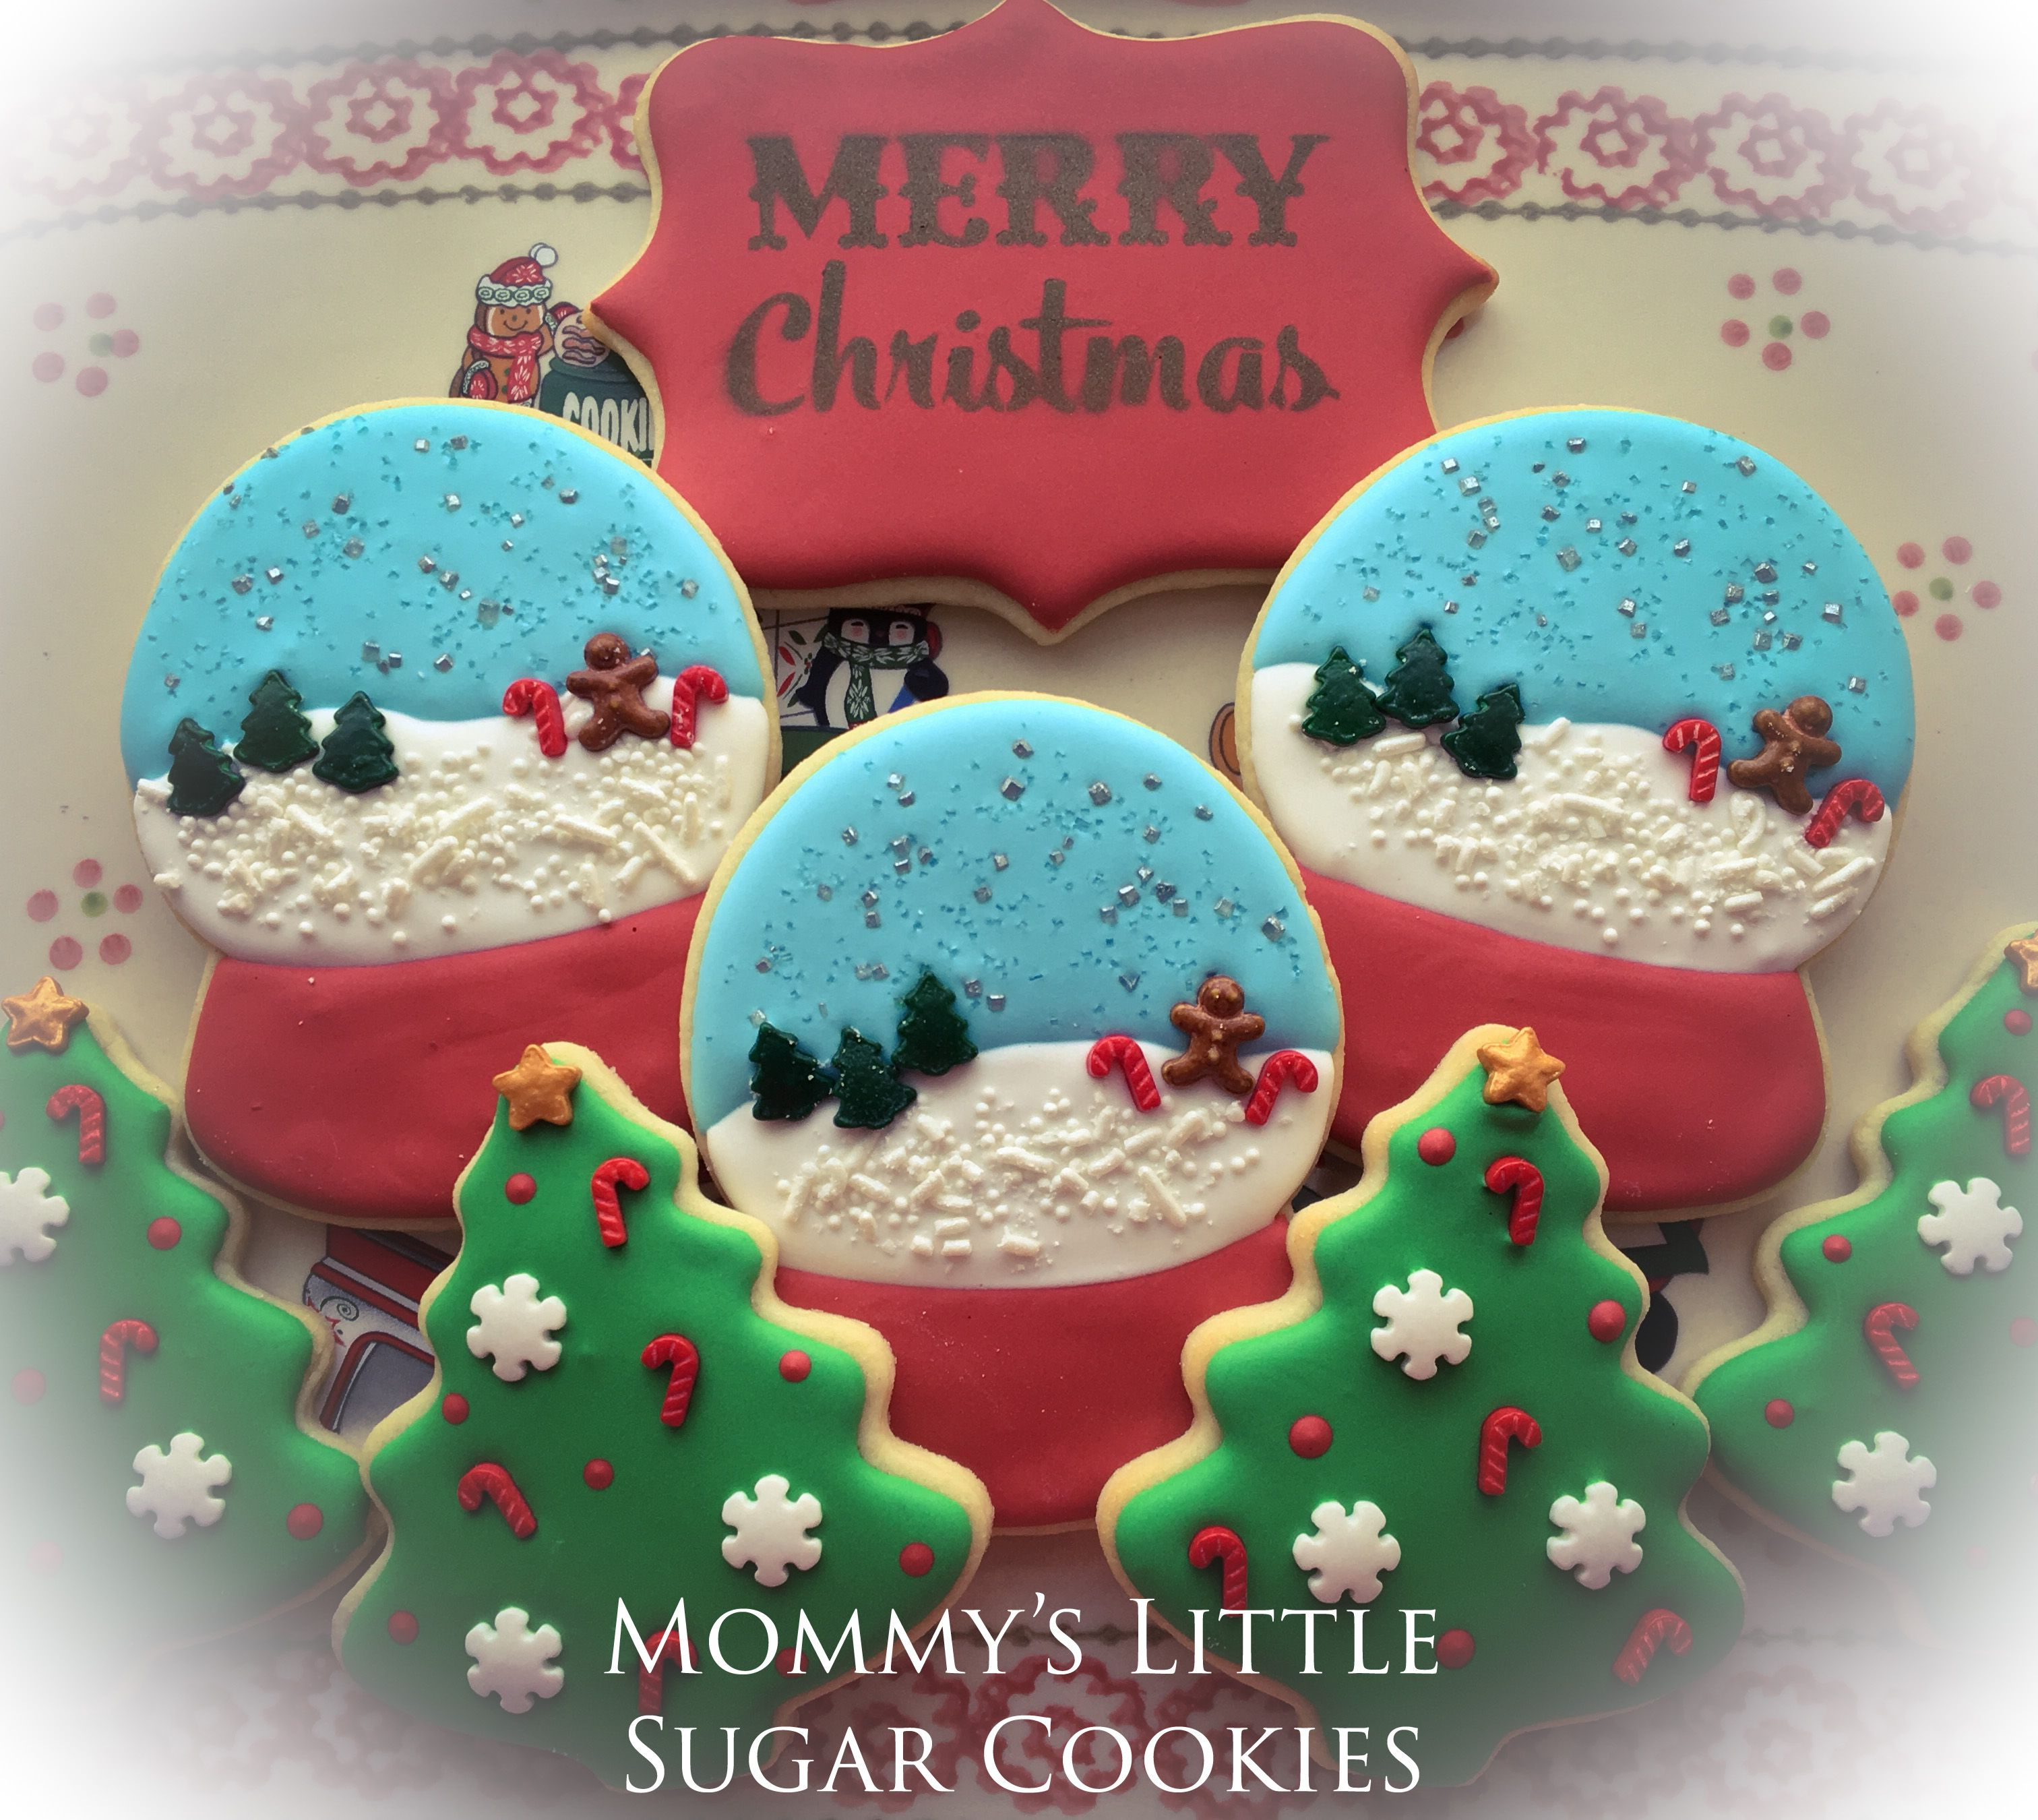 Merry Christmas Snowman Christmas Cookies Snow Globe Snow Globe